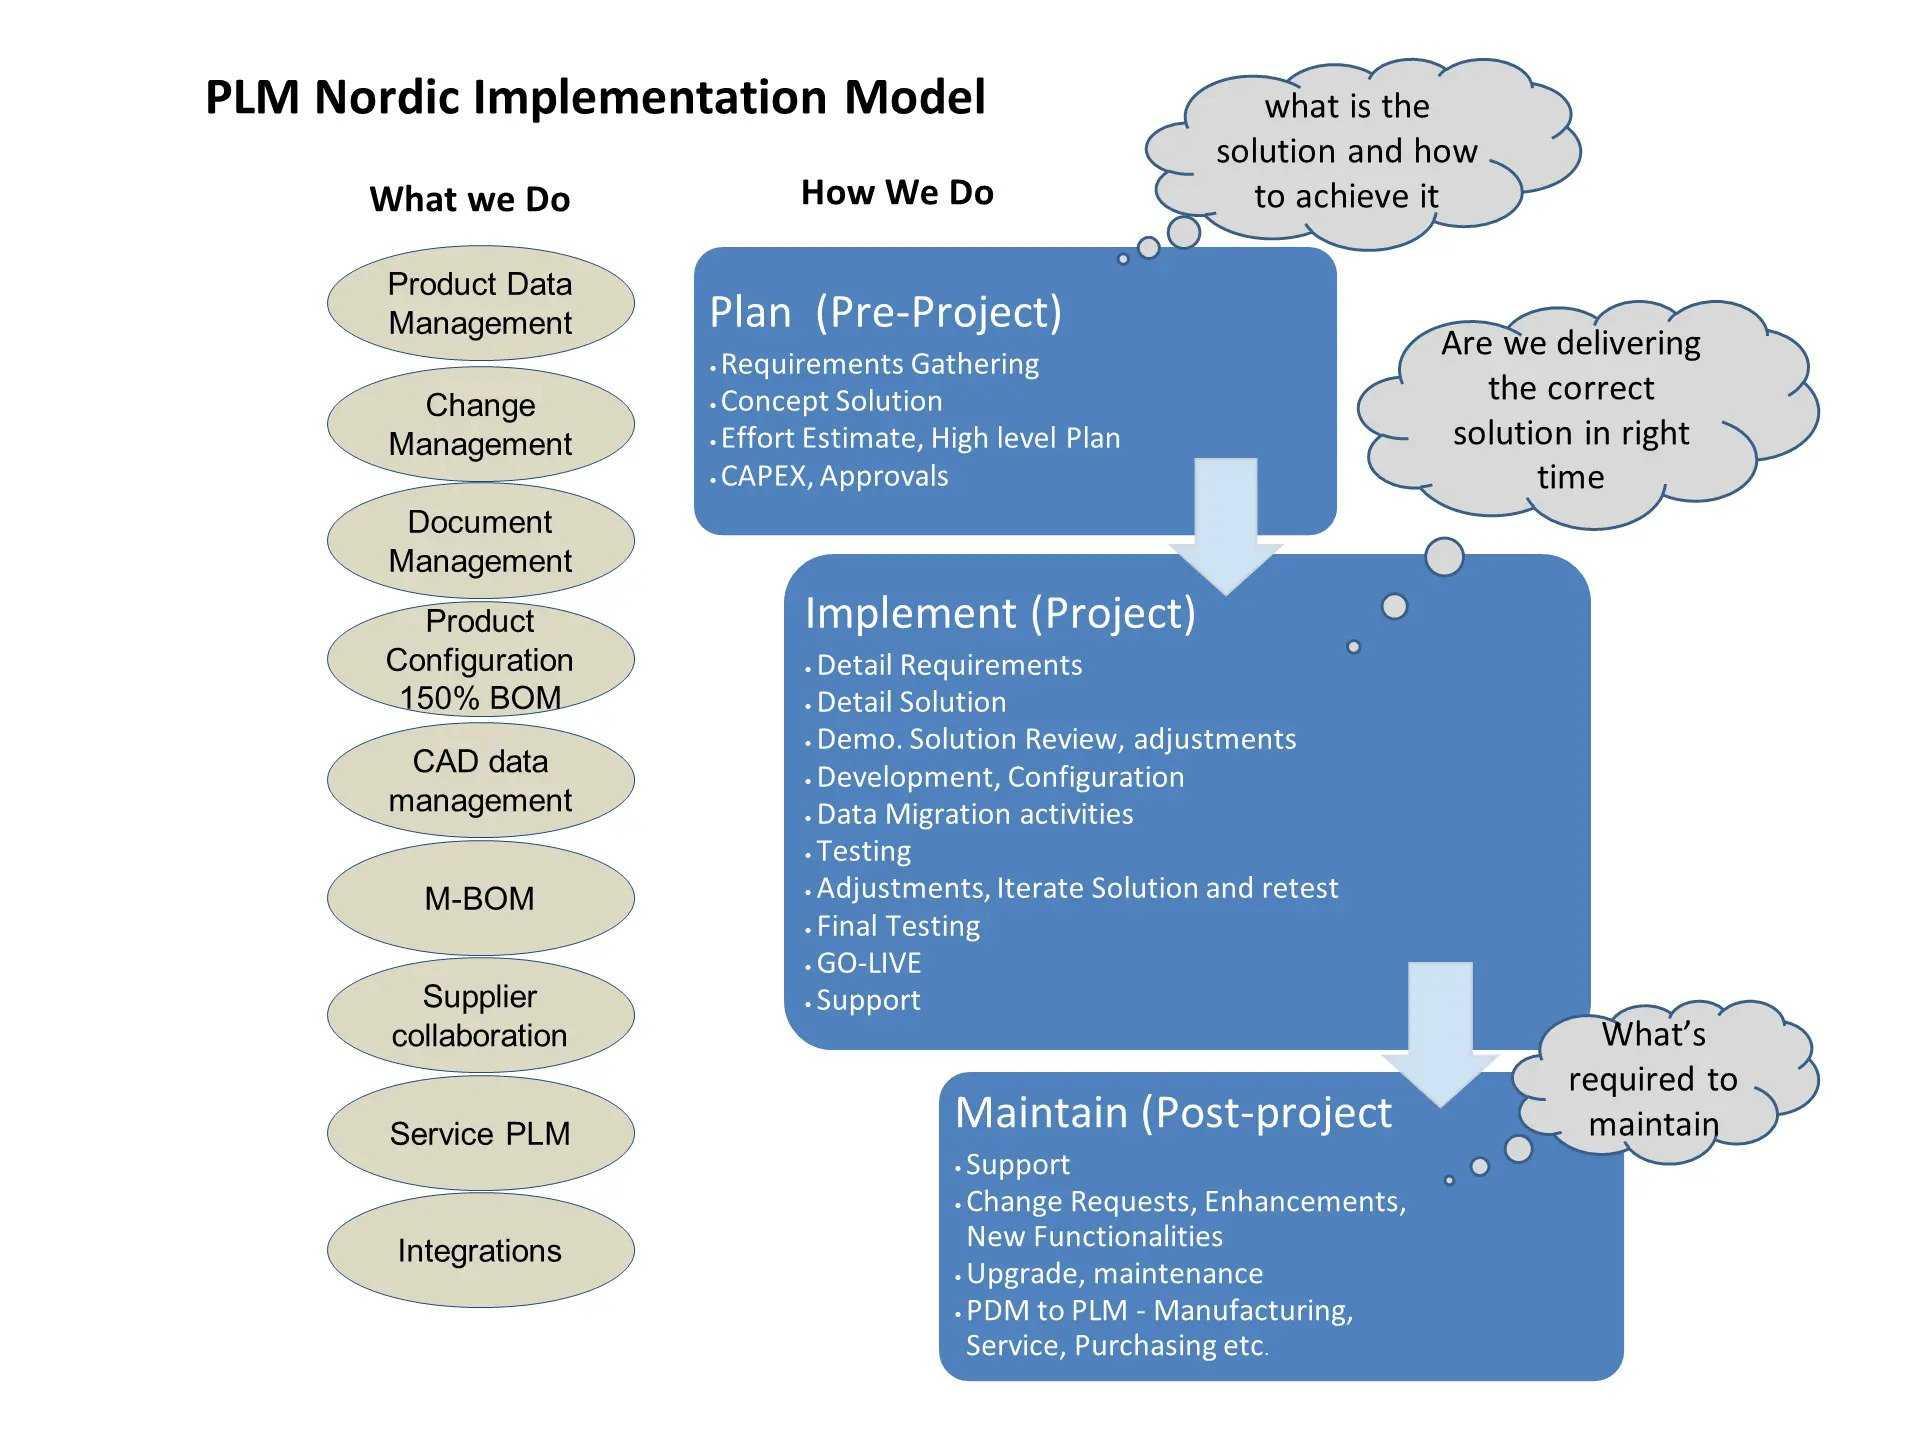 plm-nordic-implementation-model